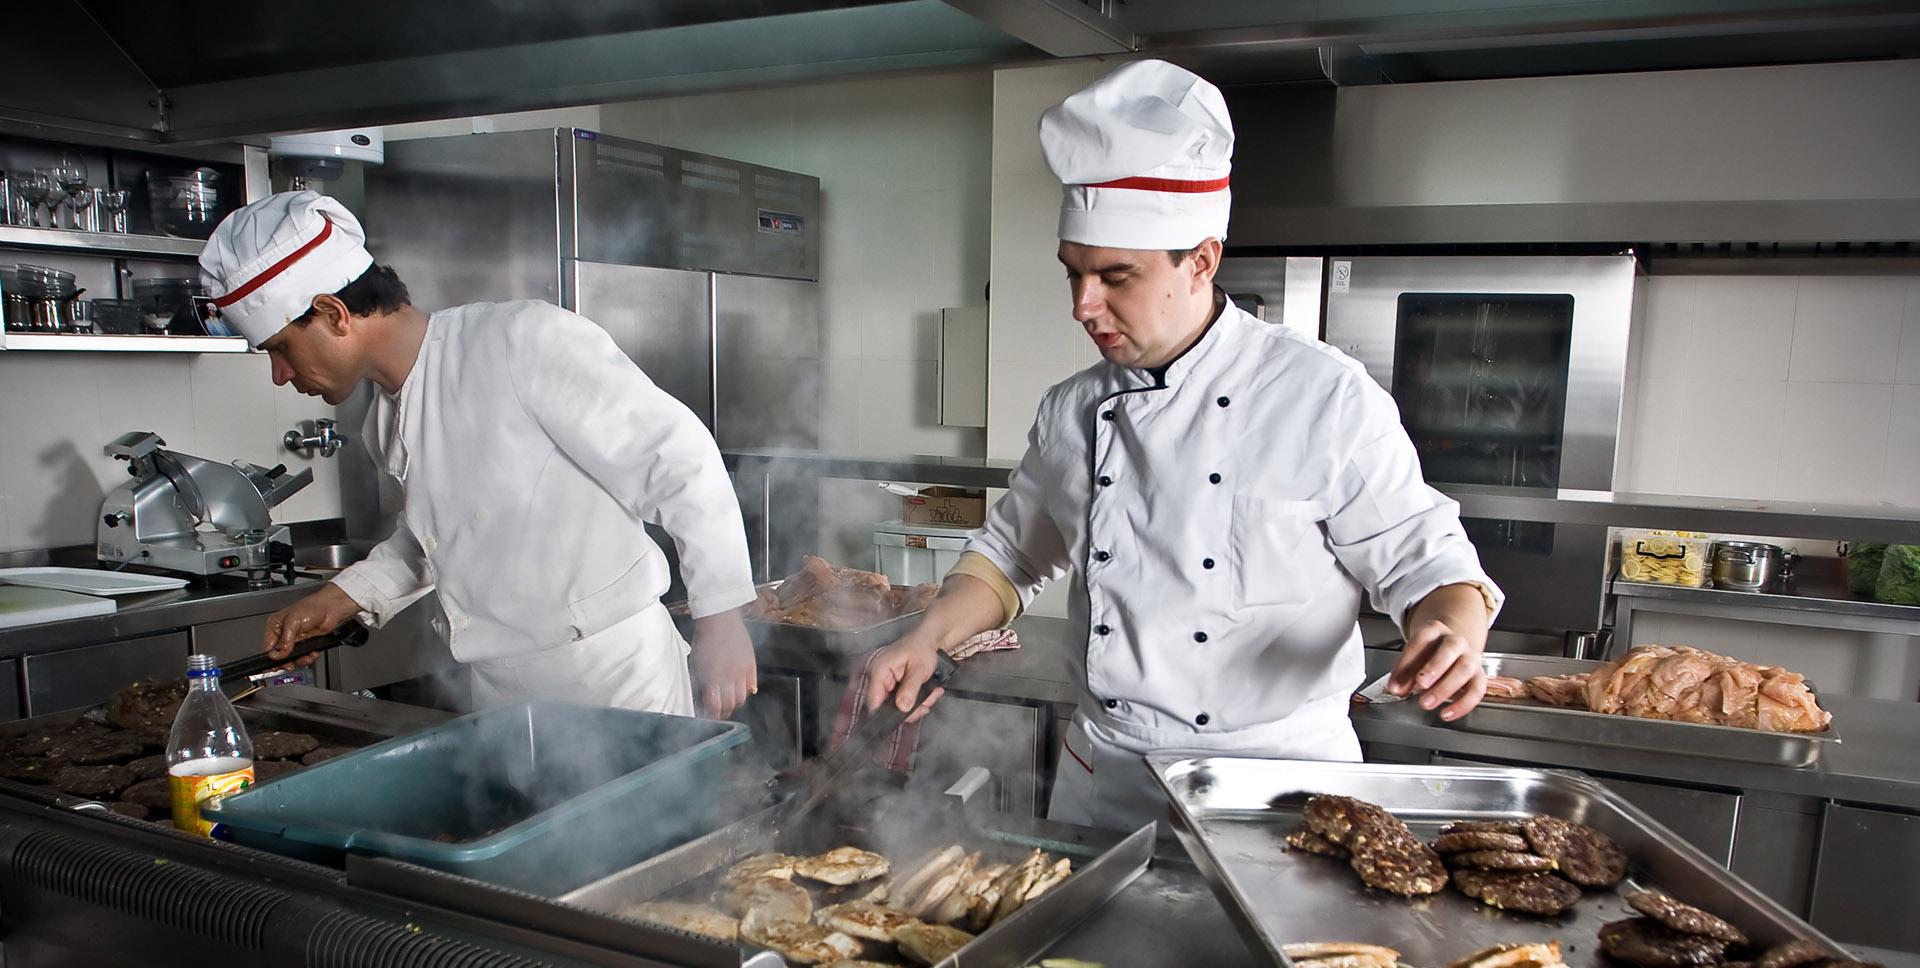 Nj Commercial Kitchen Ventilation Company Repair